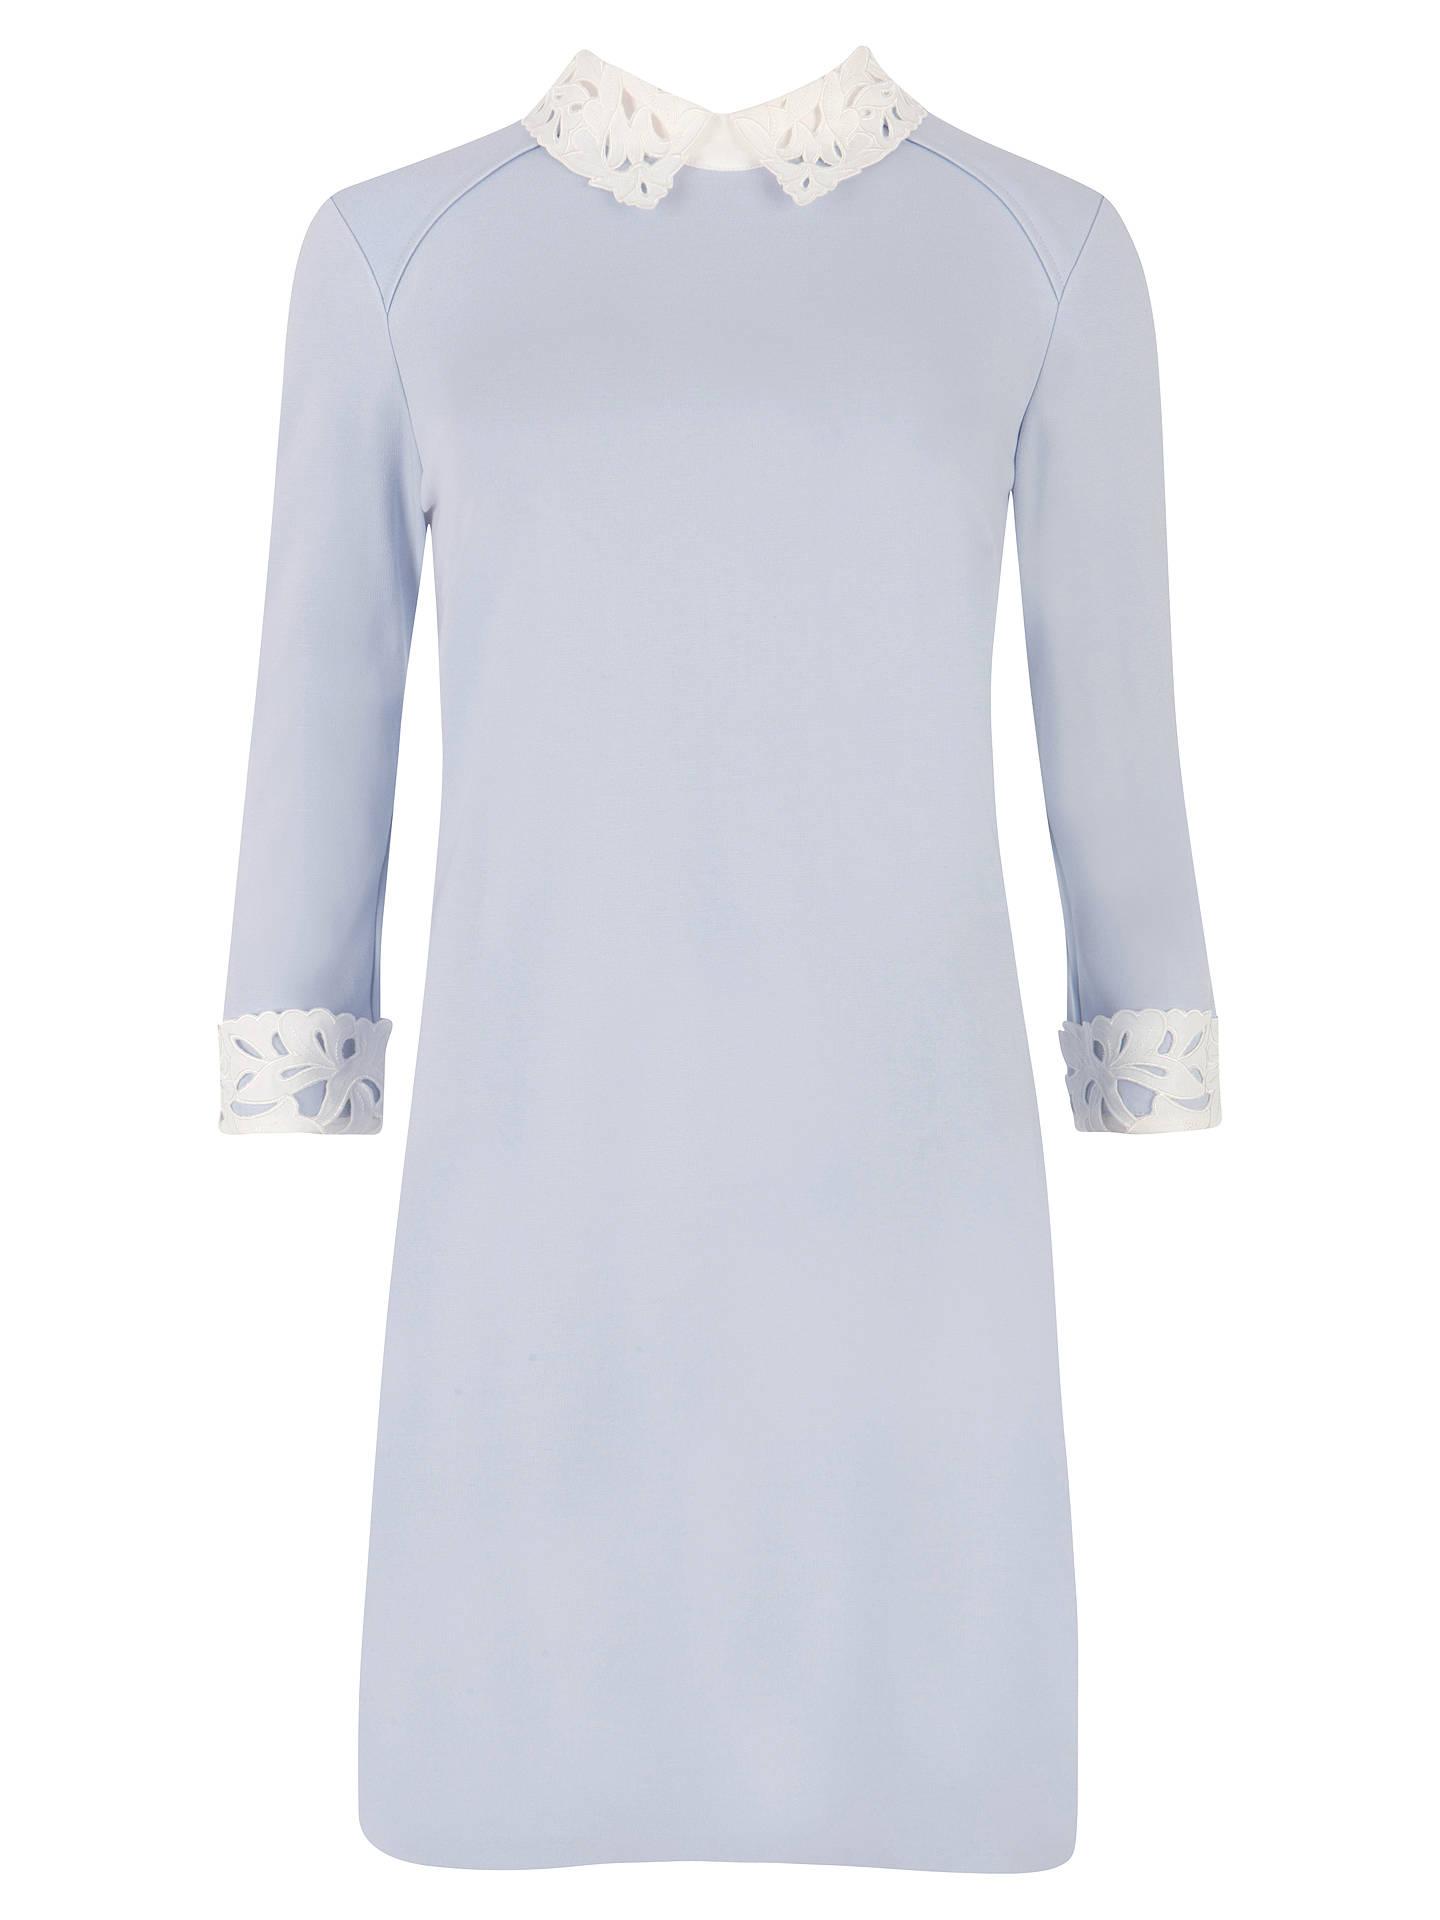 278b42fd10c Buy Ted Baker Lace Collar Tunic Dress